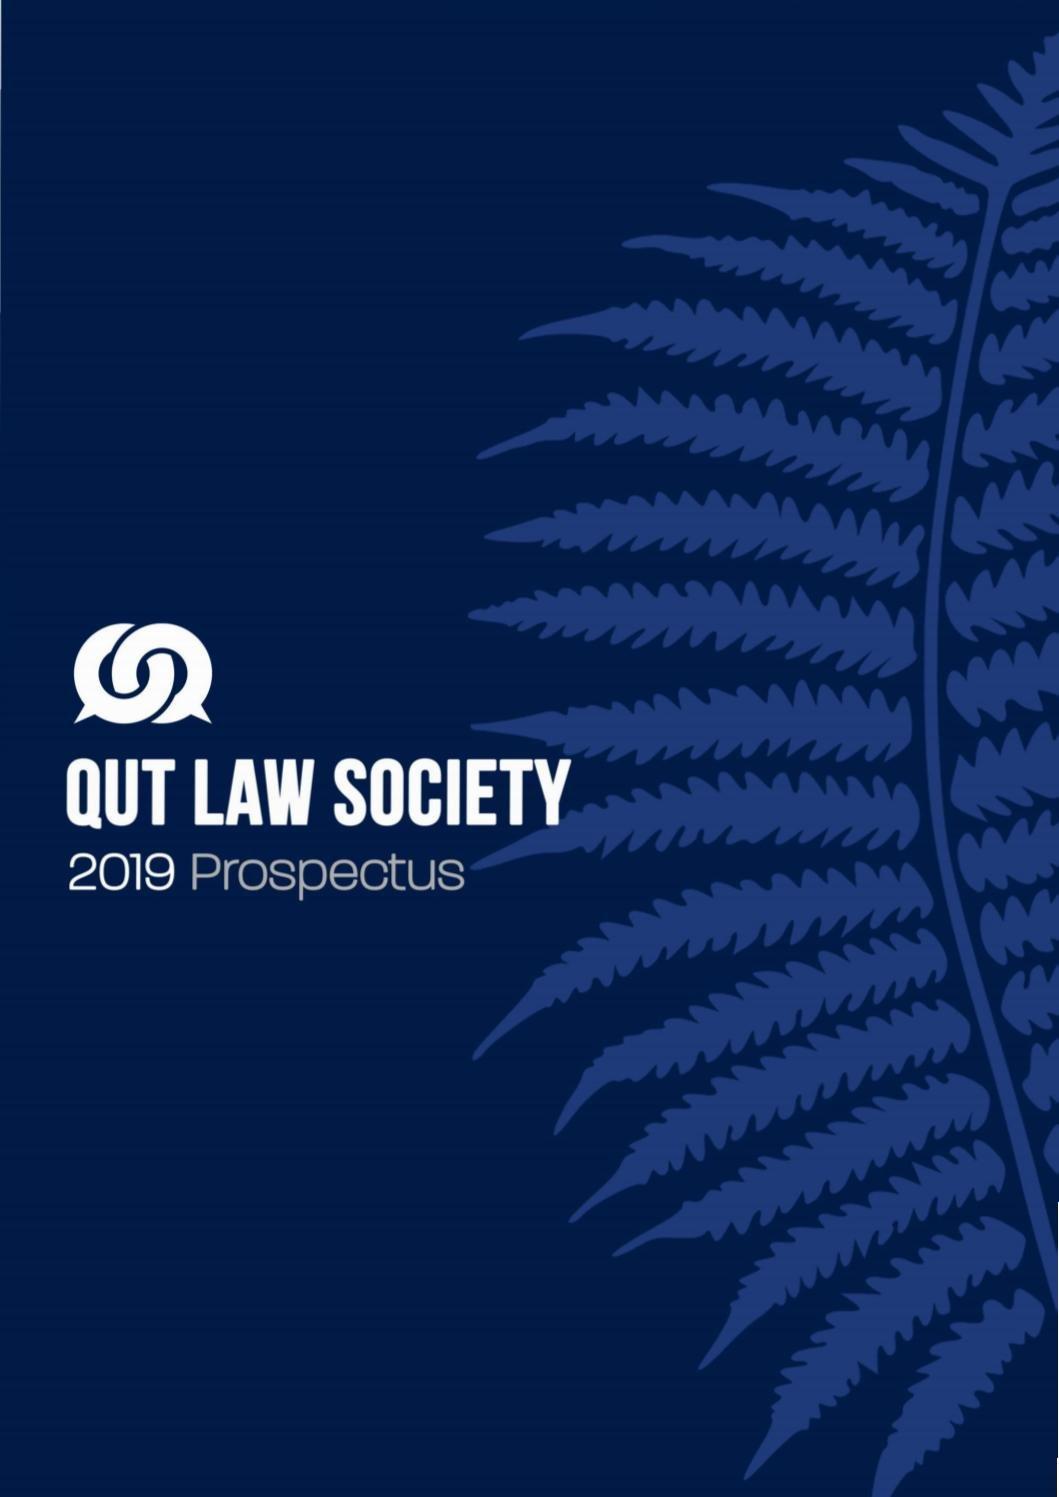 2019 Qut Law Society Sponsorship Prospectusqut Law Society - Issuu Calendar 2019 Qut